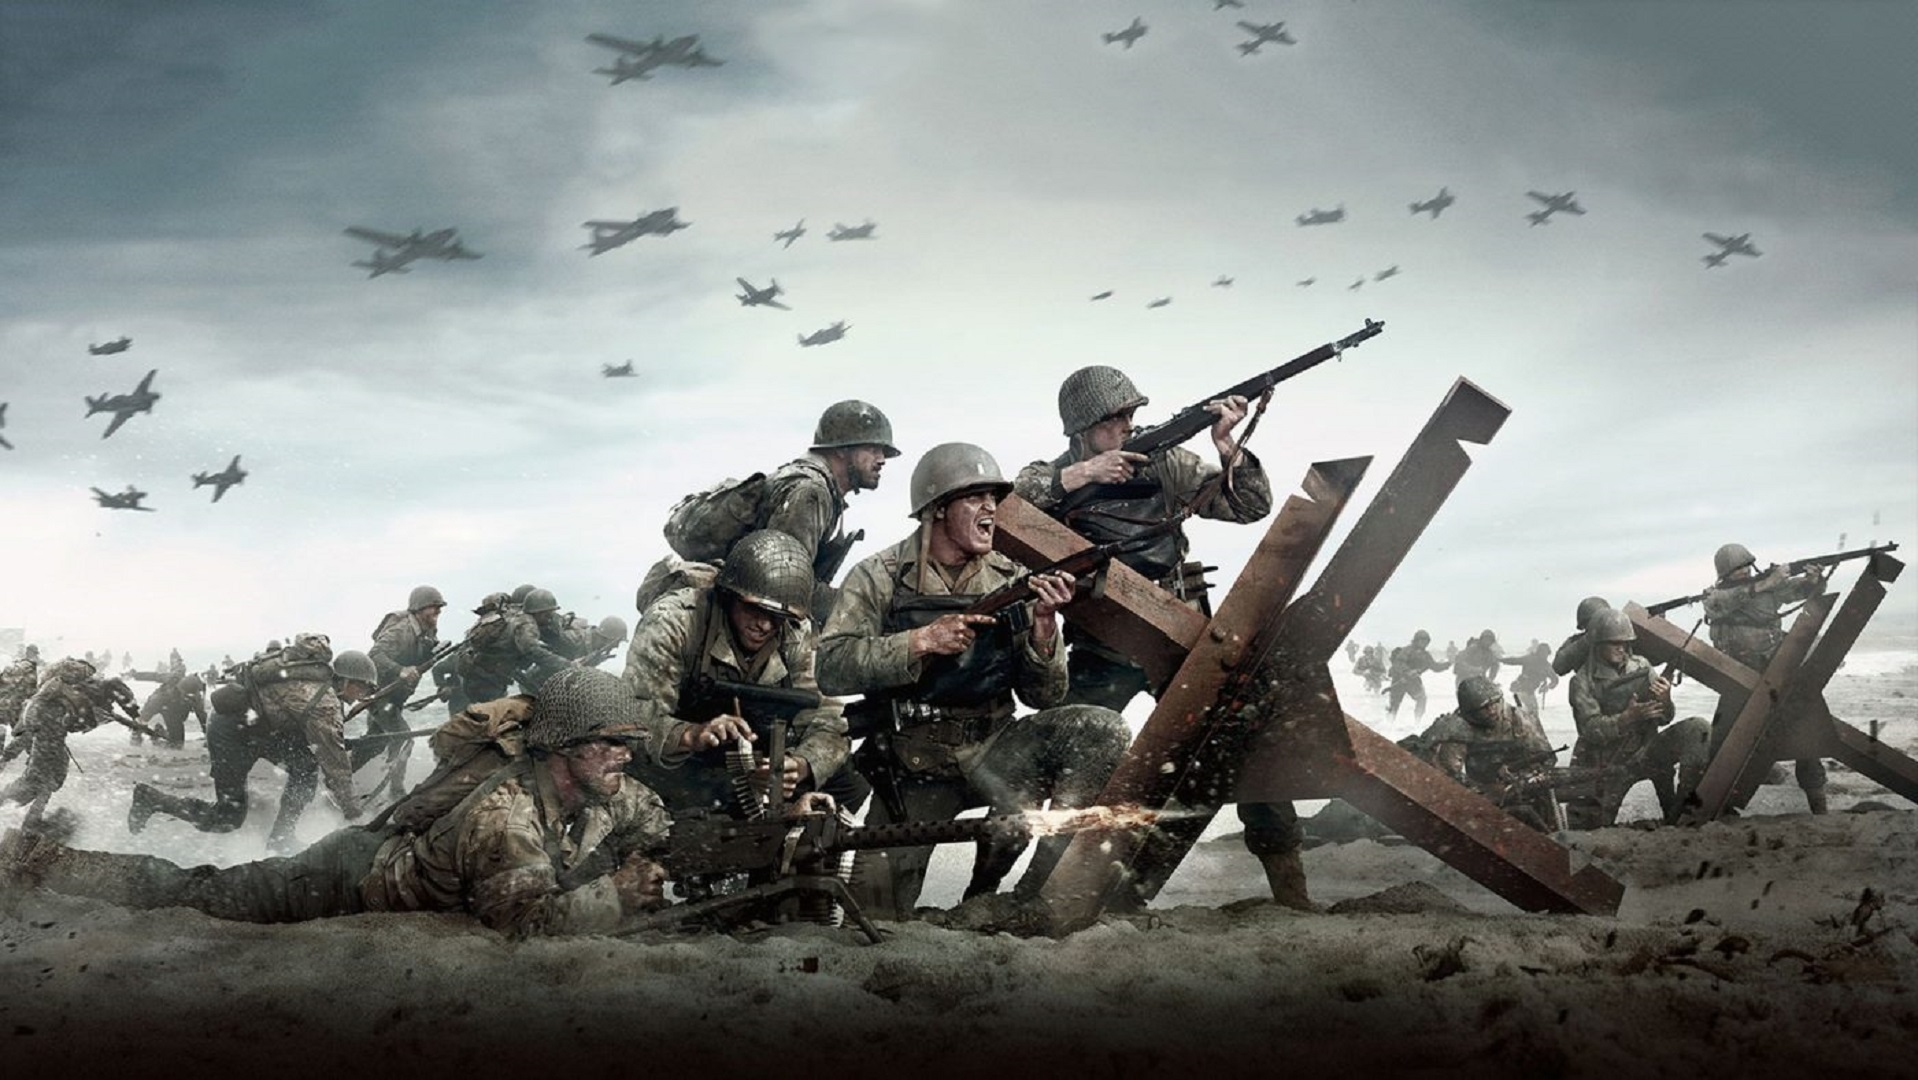 تاریخ انتشار بازی Call of Duty: Vanguard